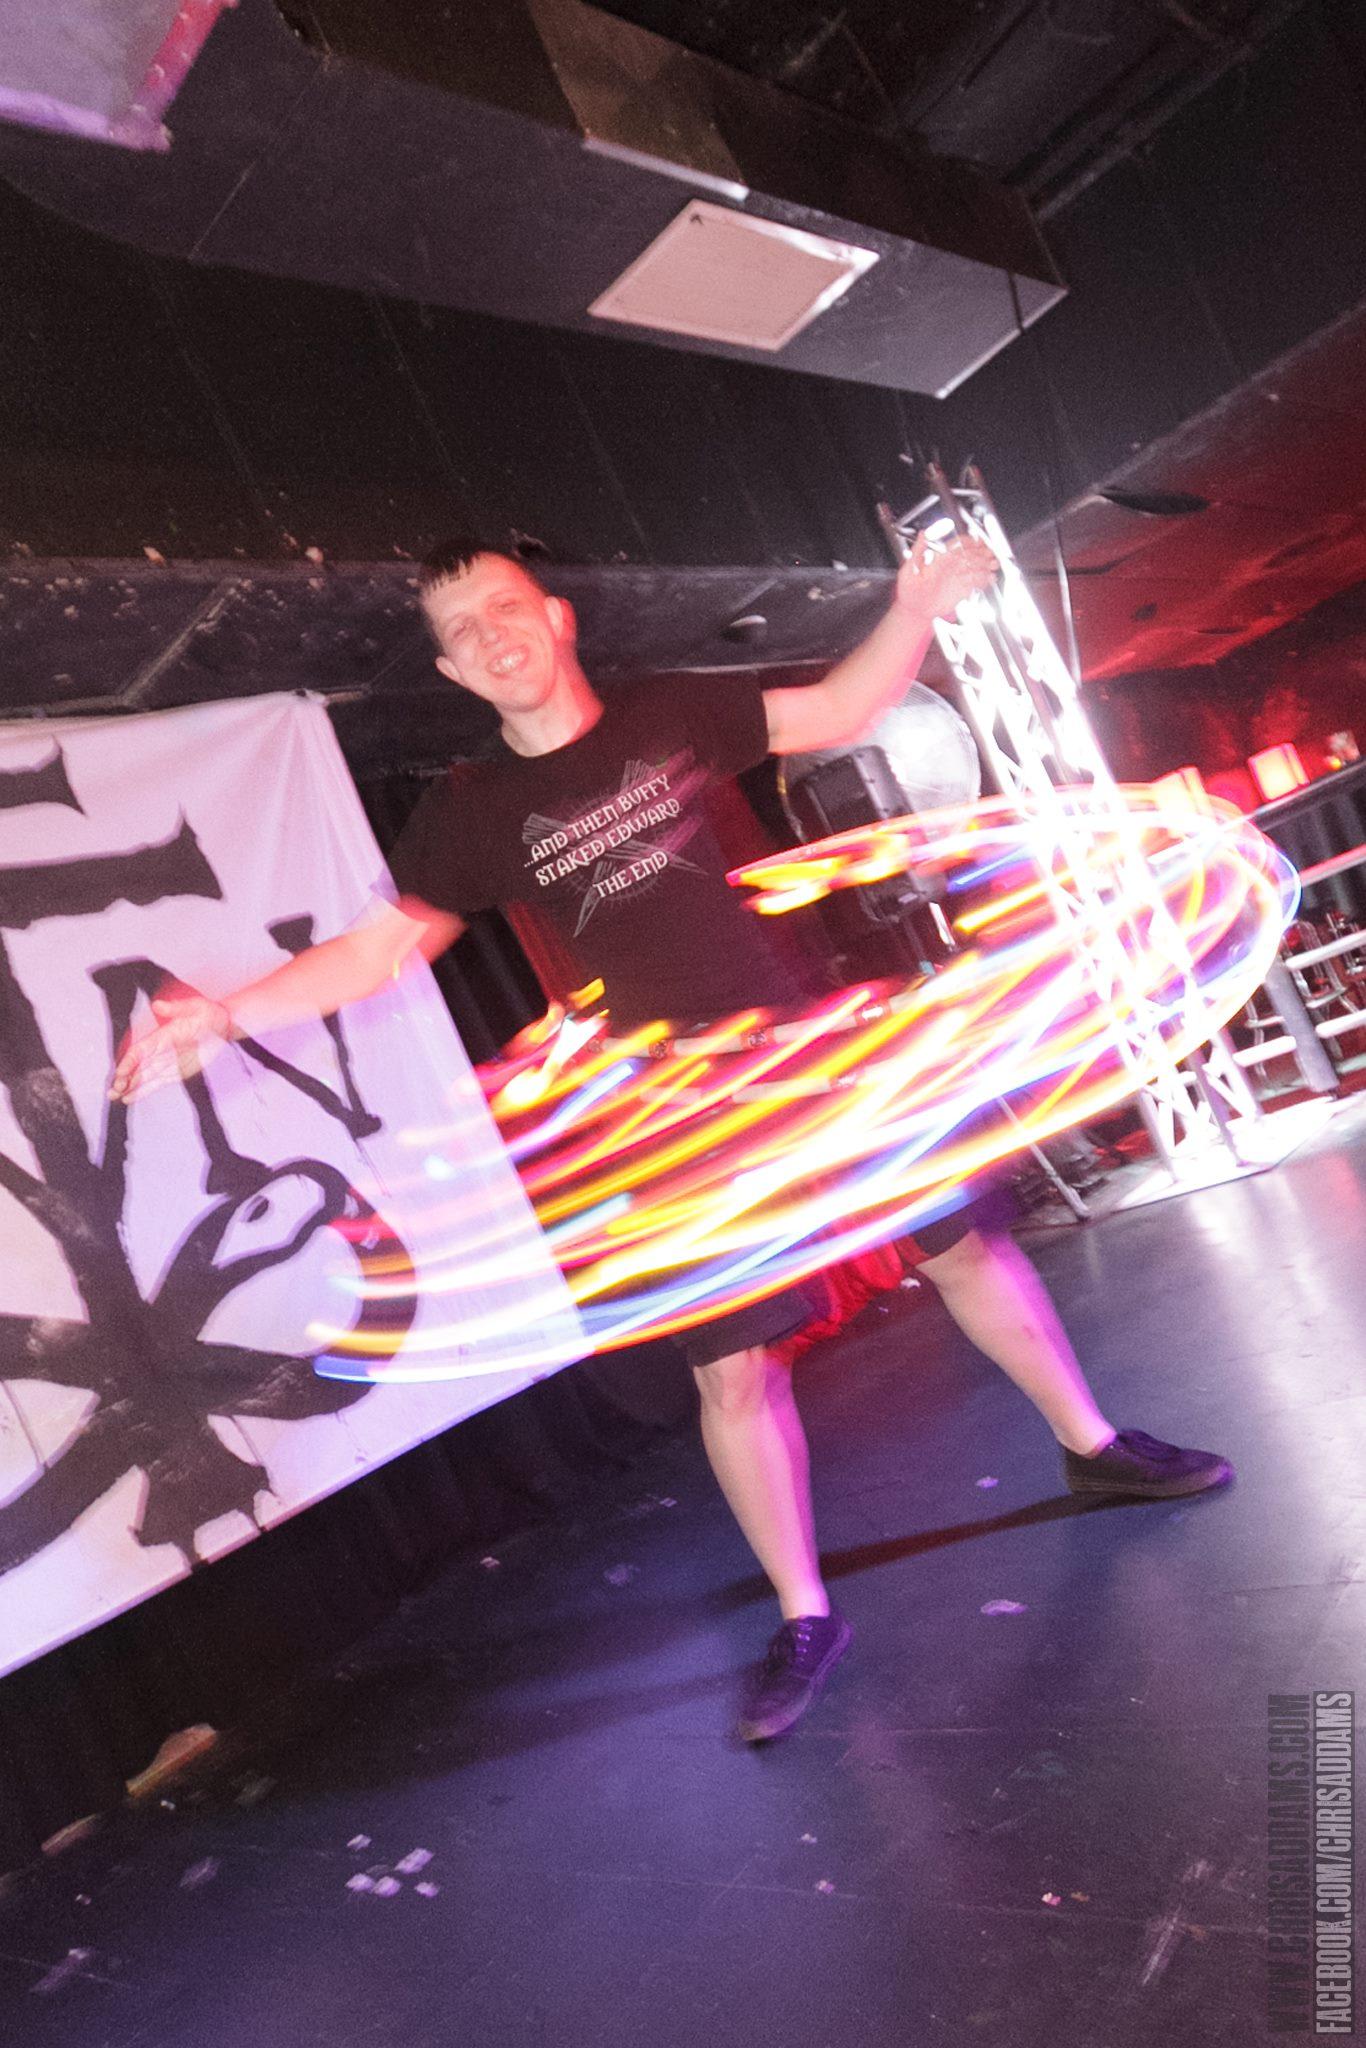 TheHavenClub-Goth-Industrial-Dance-Alternative-Northampton-MA (13).jpg